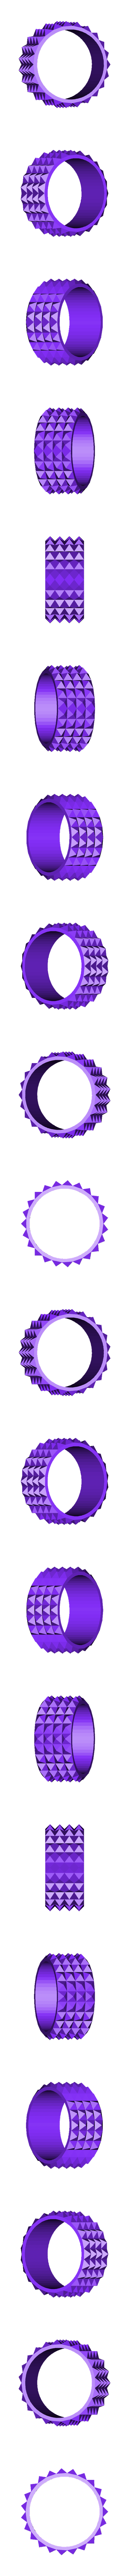 "06.stl Download free STL file the ""Bling Rings"" • 3D print model, leFabShop"